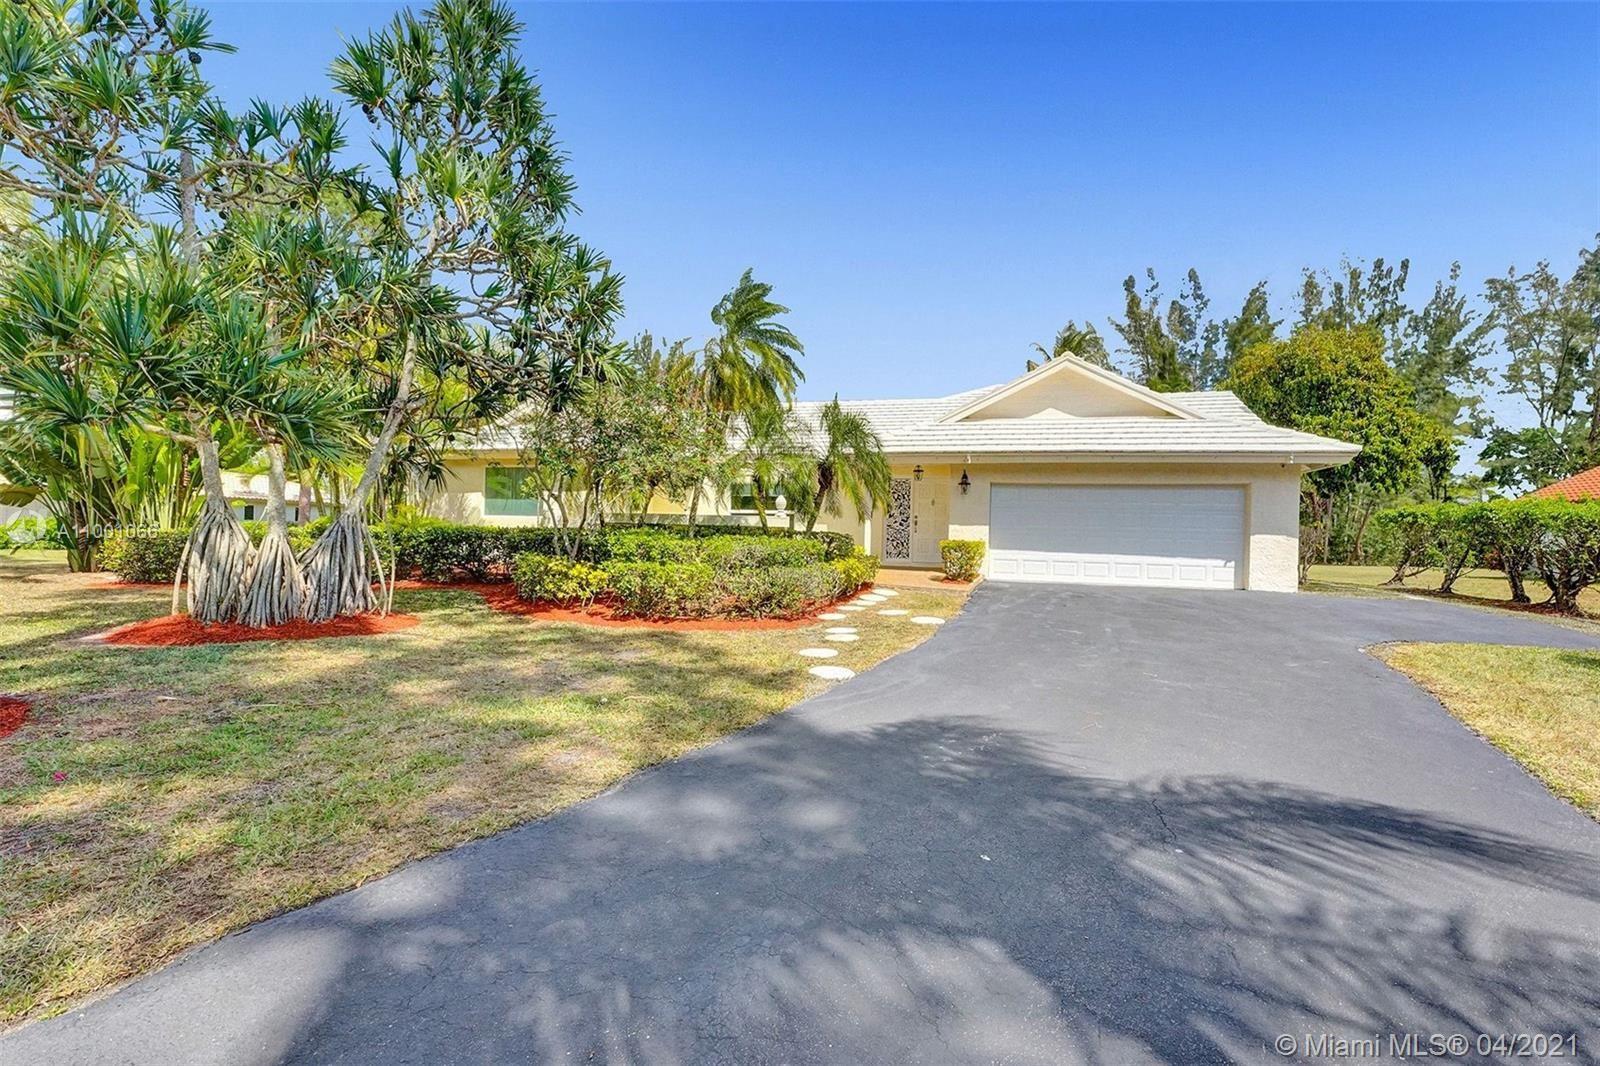 22118 Woodset Ln, Boca Raton, FL 33428 - #: A11001066